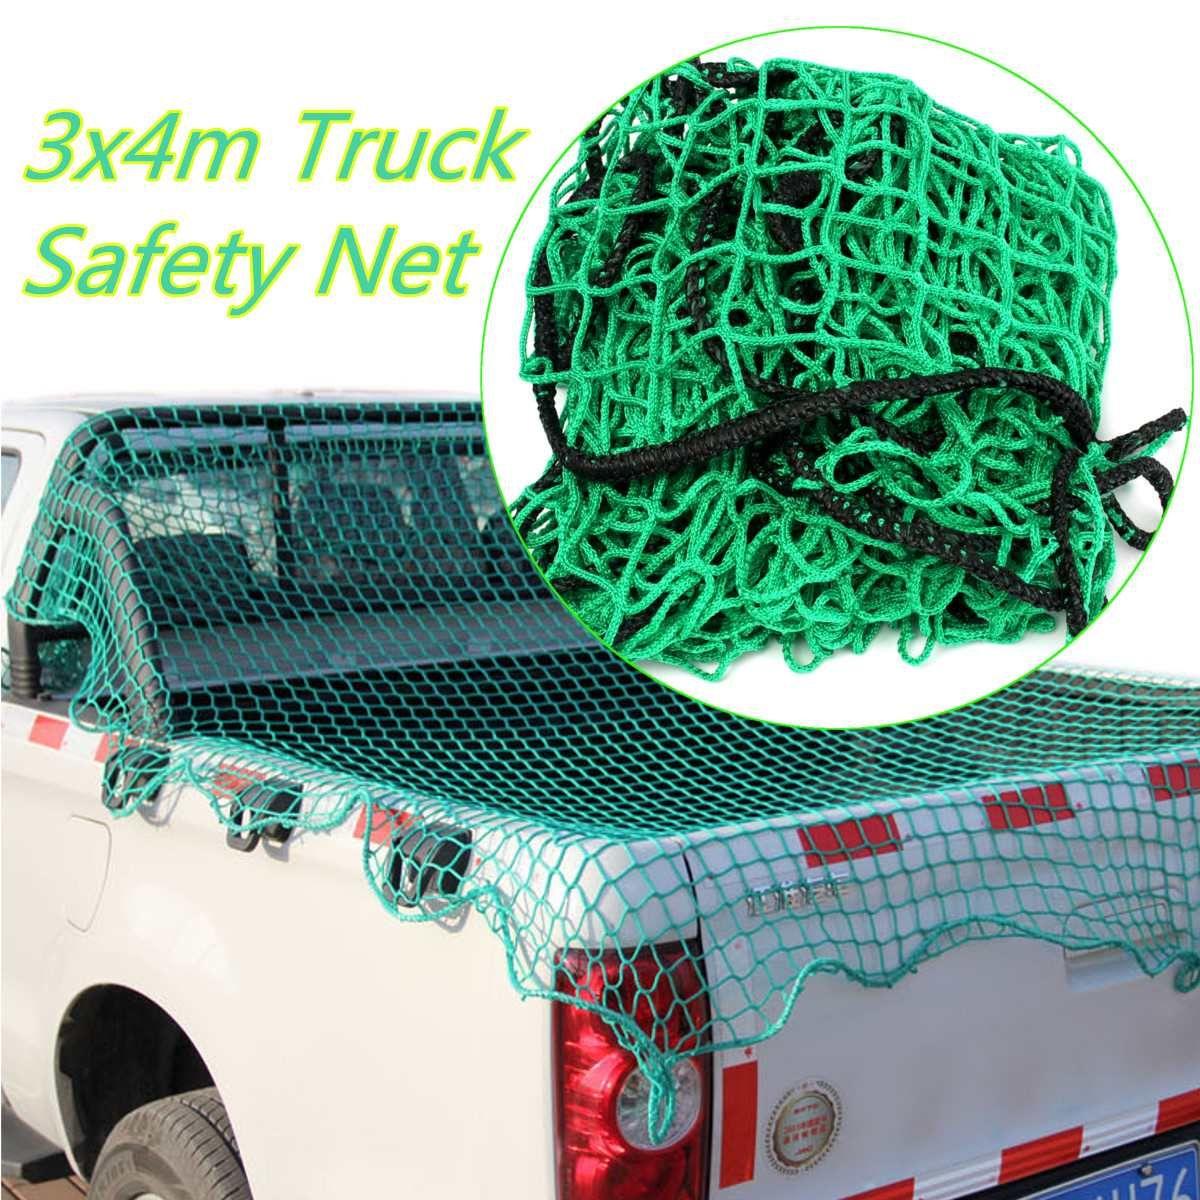 300cmx400cm Heavy   Cargo Net Pickup Truck Trailer Dumpster Car Safety Mesh Covers